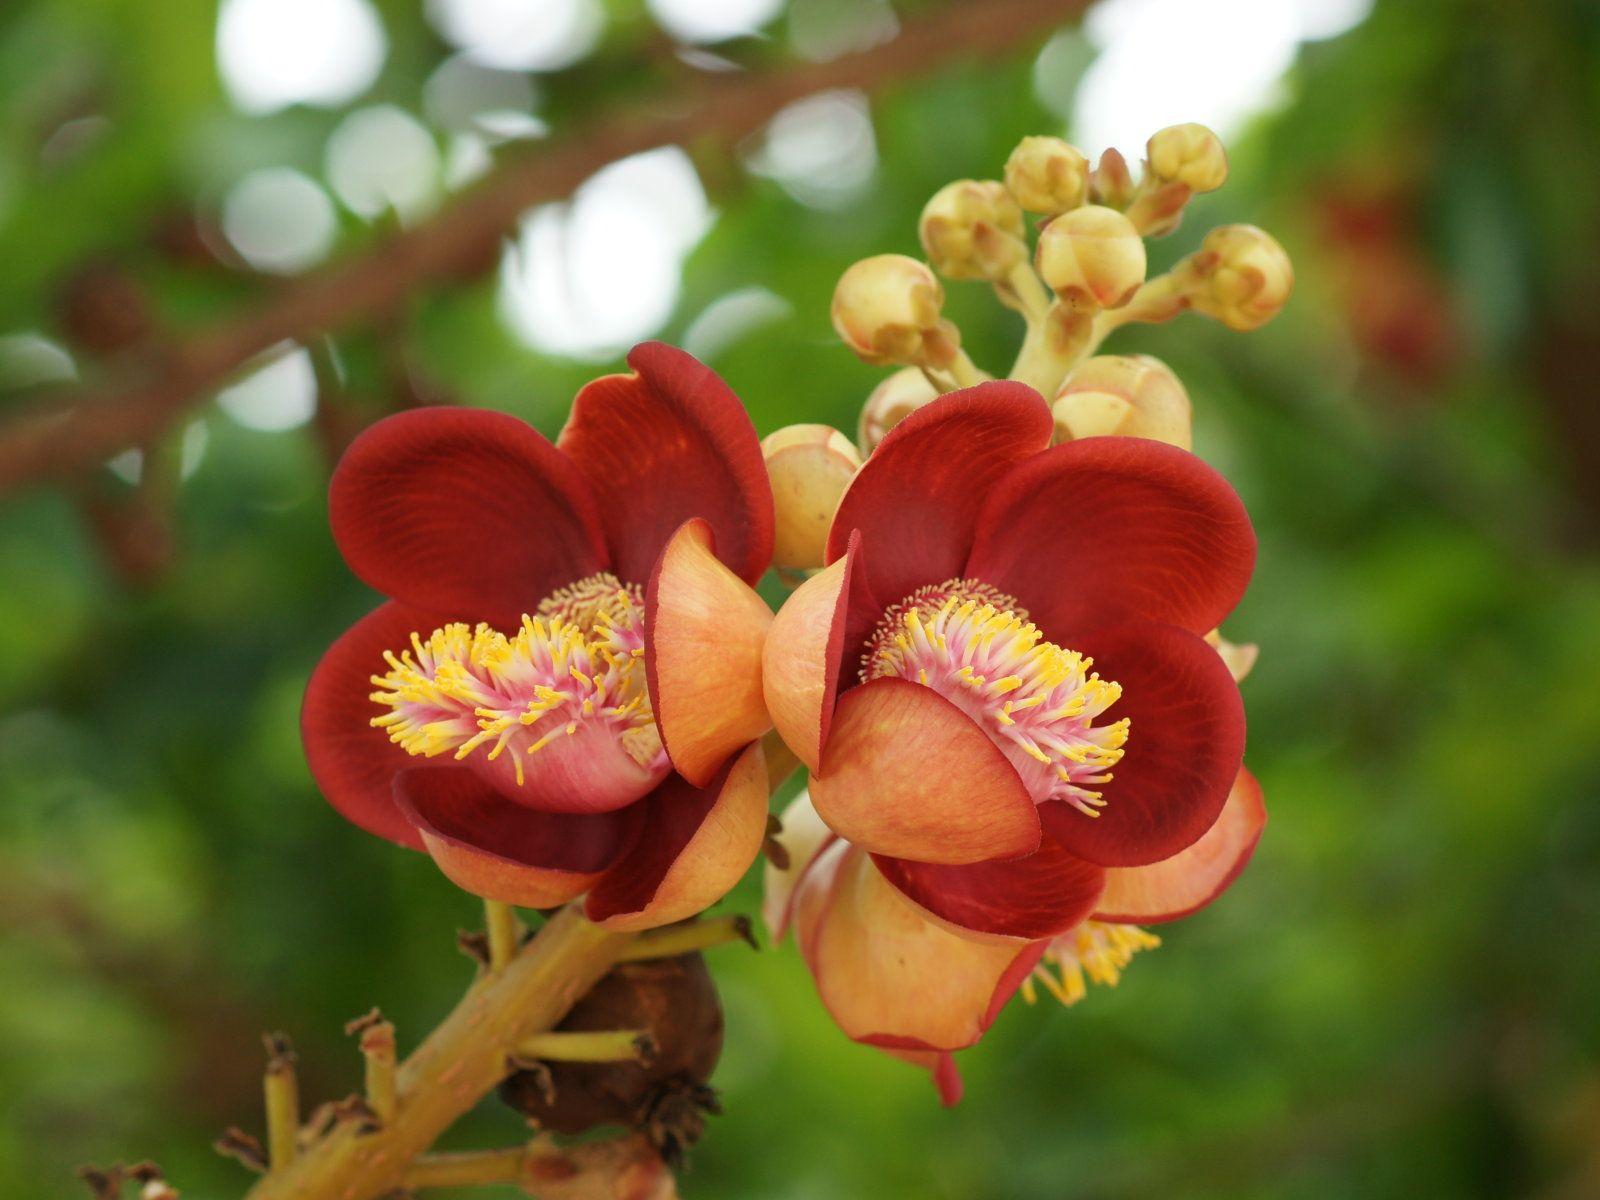 Exotic flowers beautiful exotic flowers wild flowers pinterest exotic flowers beautiful exotic flowers izmirmasajfo Images